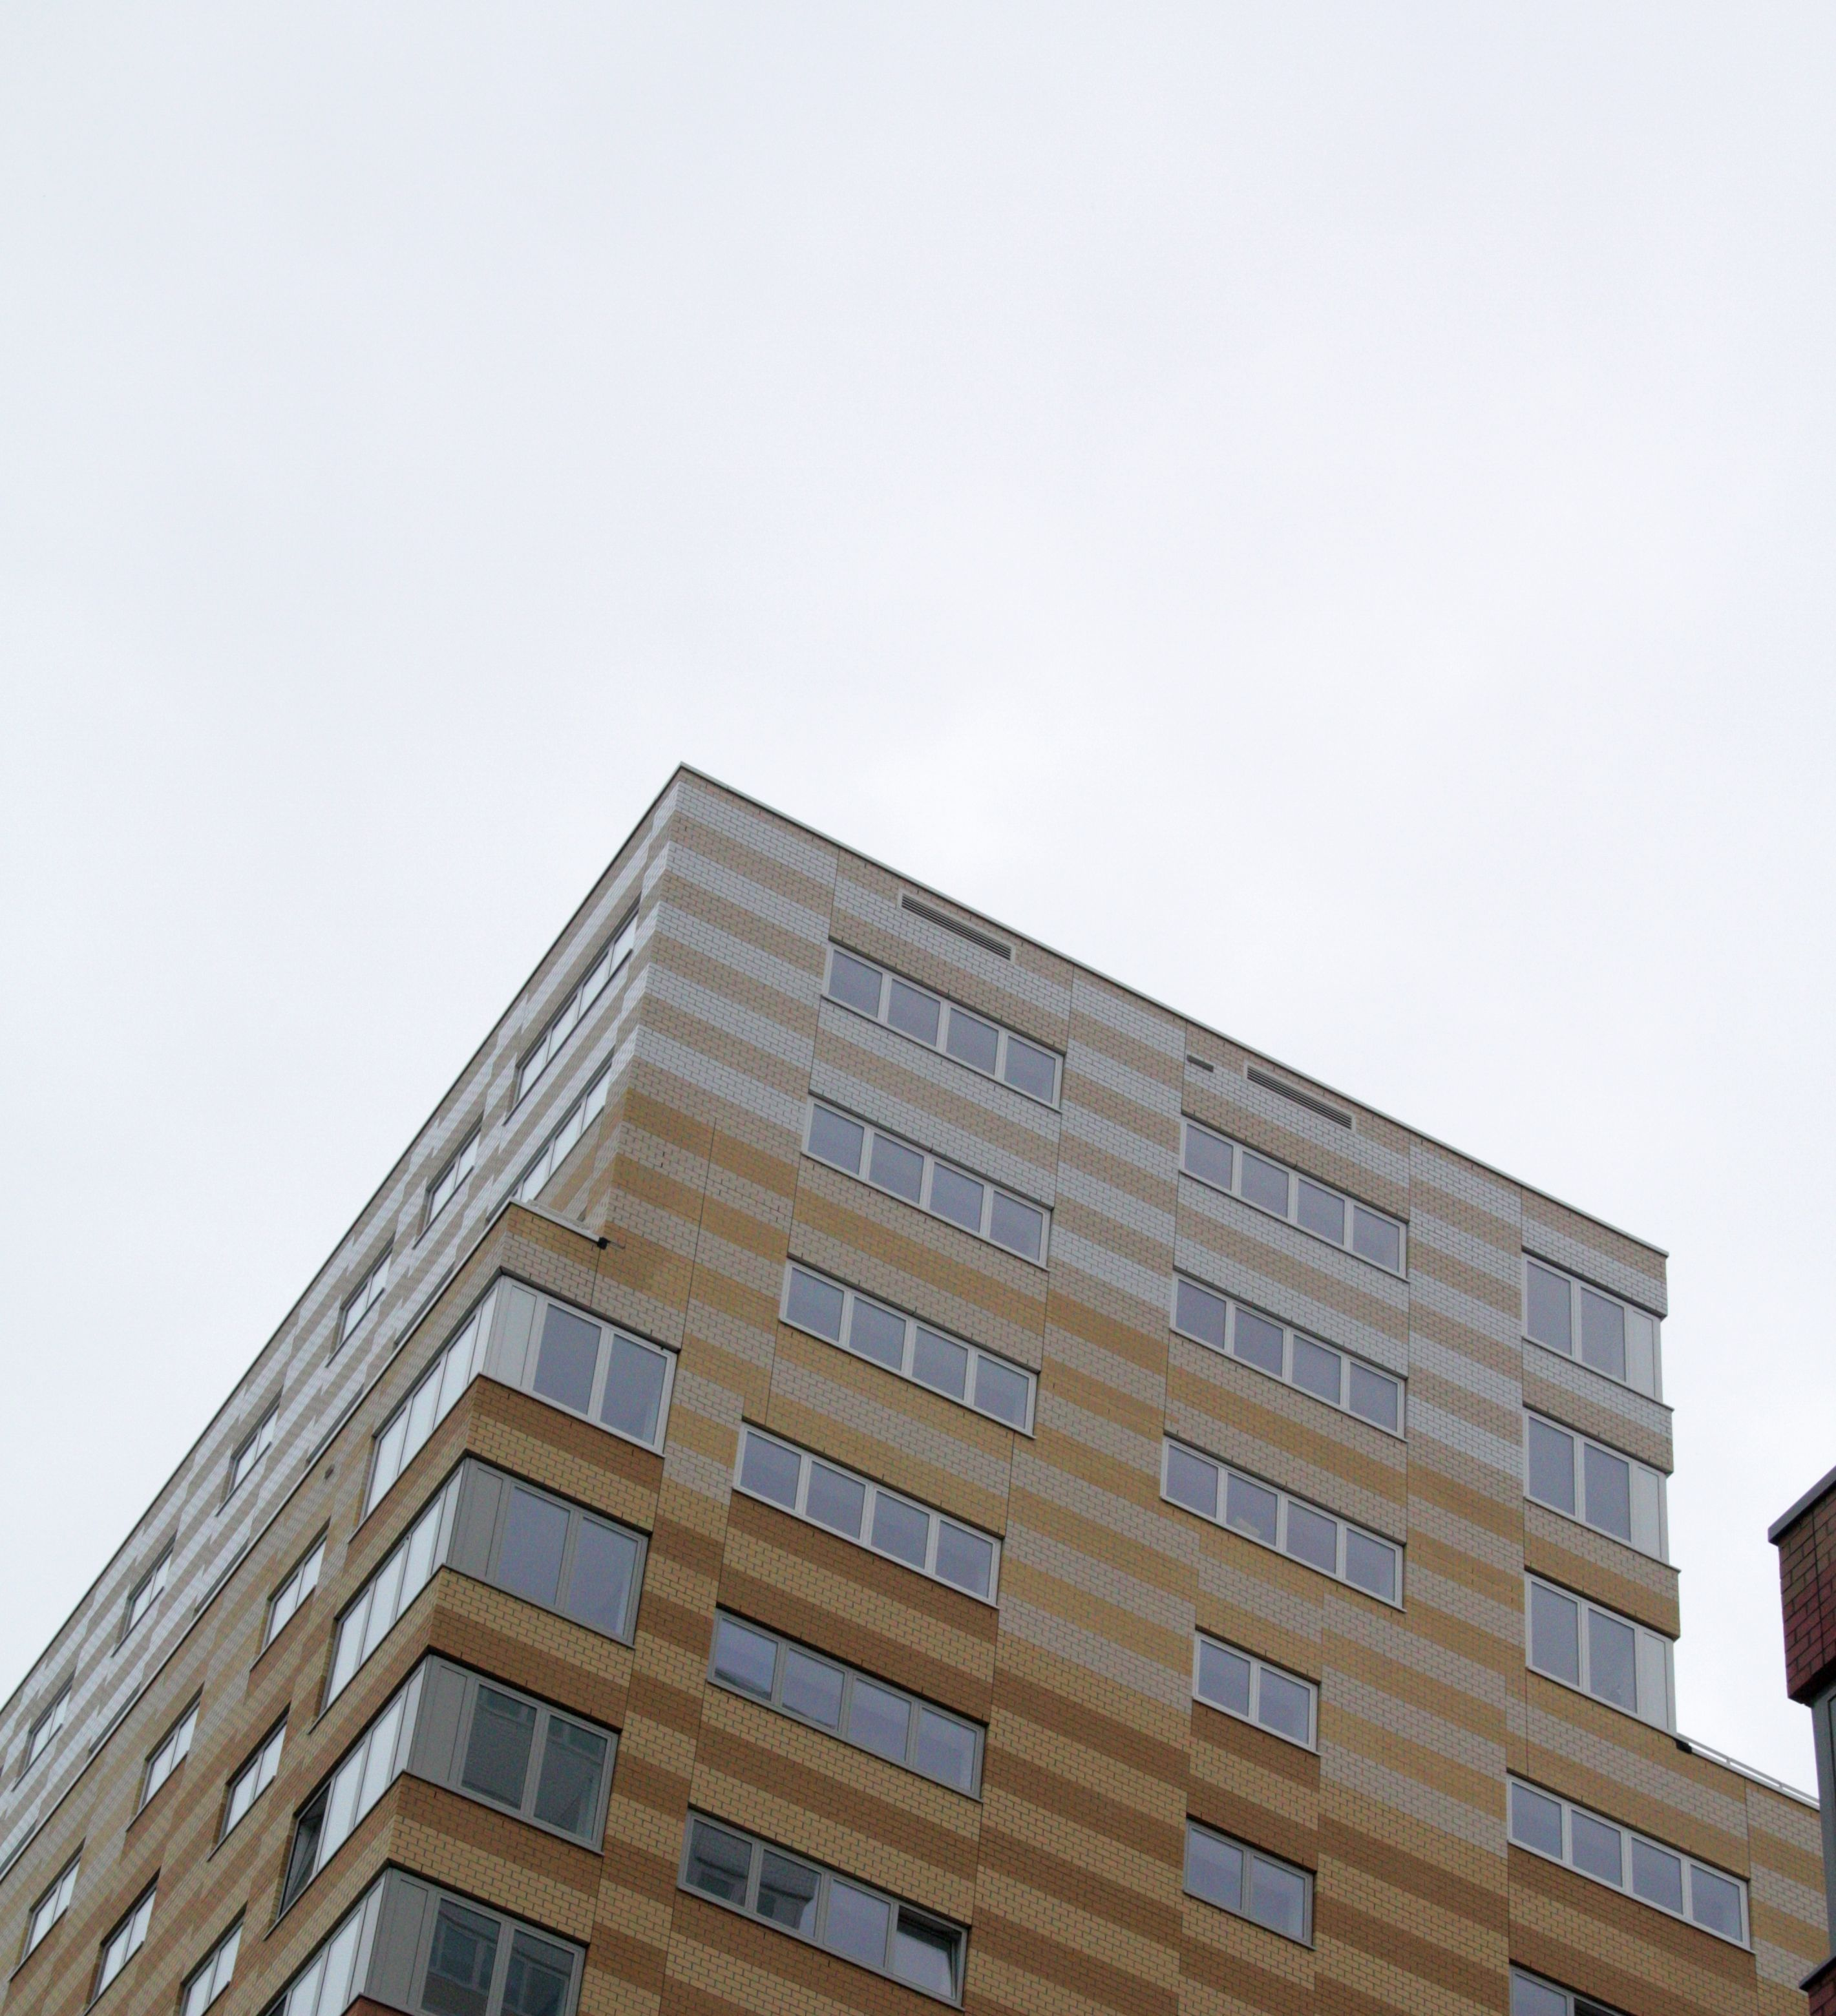 Appartementen winkelcentrum amsterdam st joris st for Amsterdam products